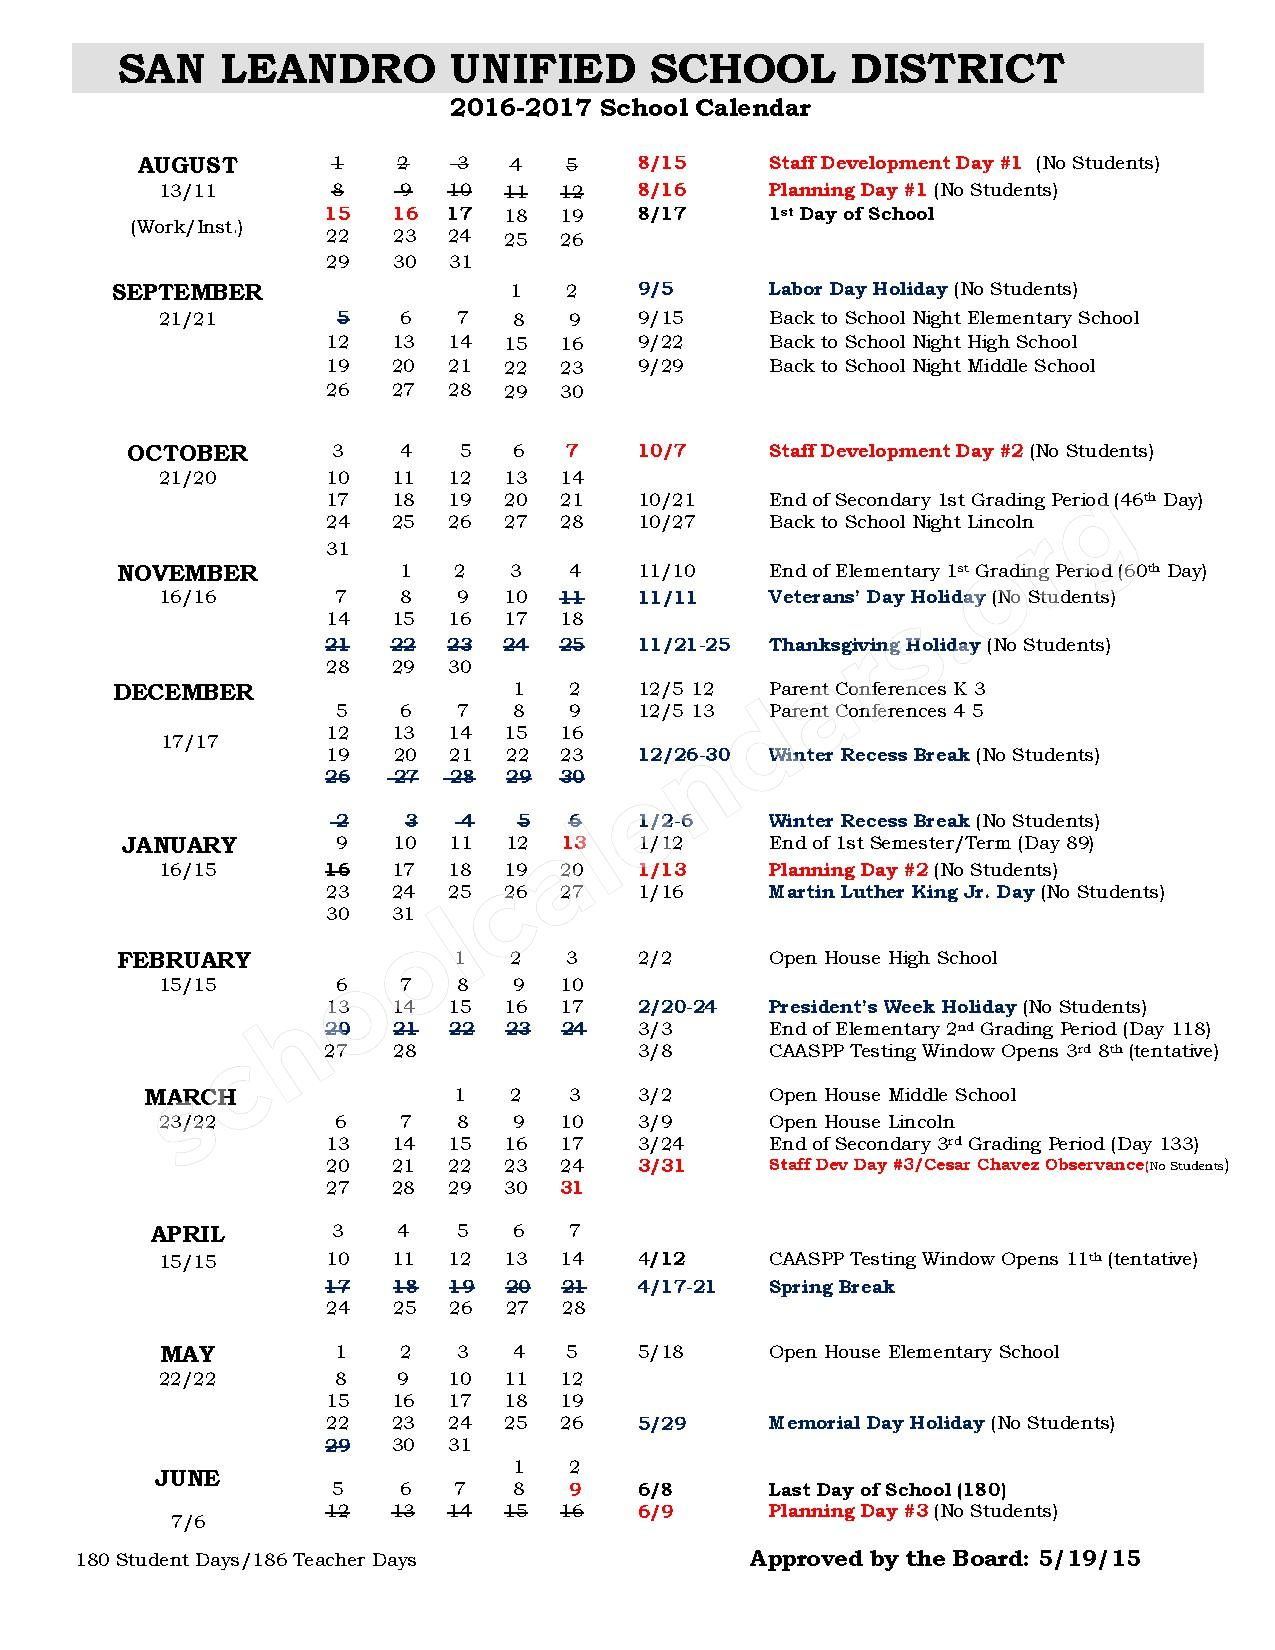 2016 - 2017 School Calendar – San Leandro Unified School District – page 1